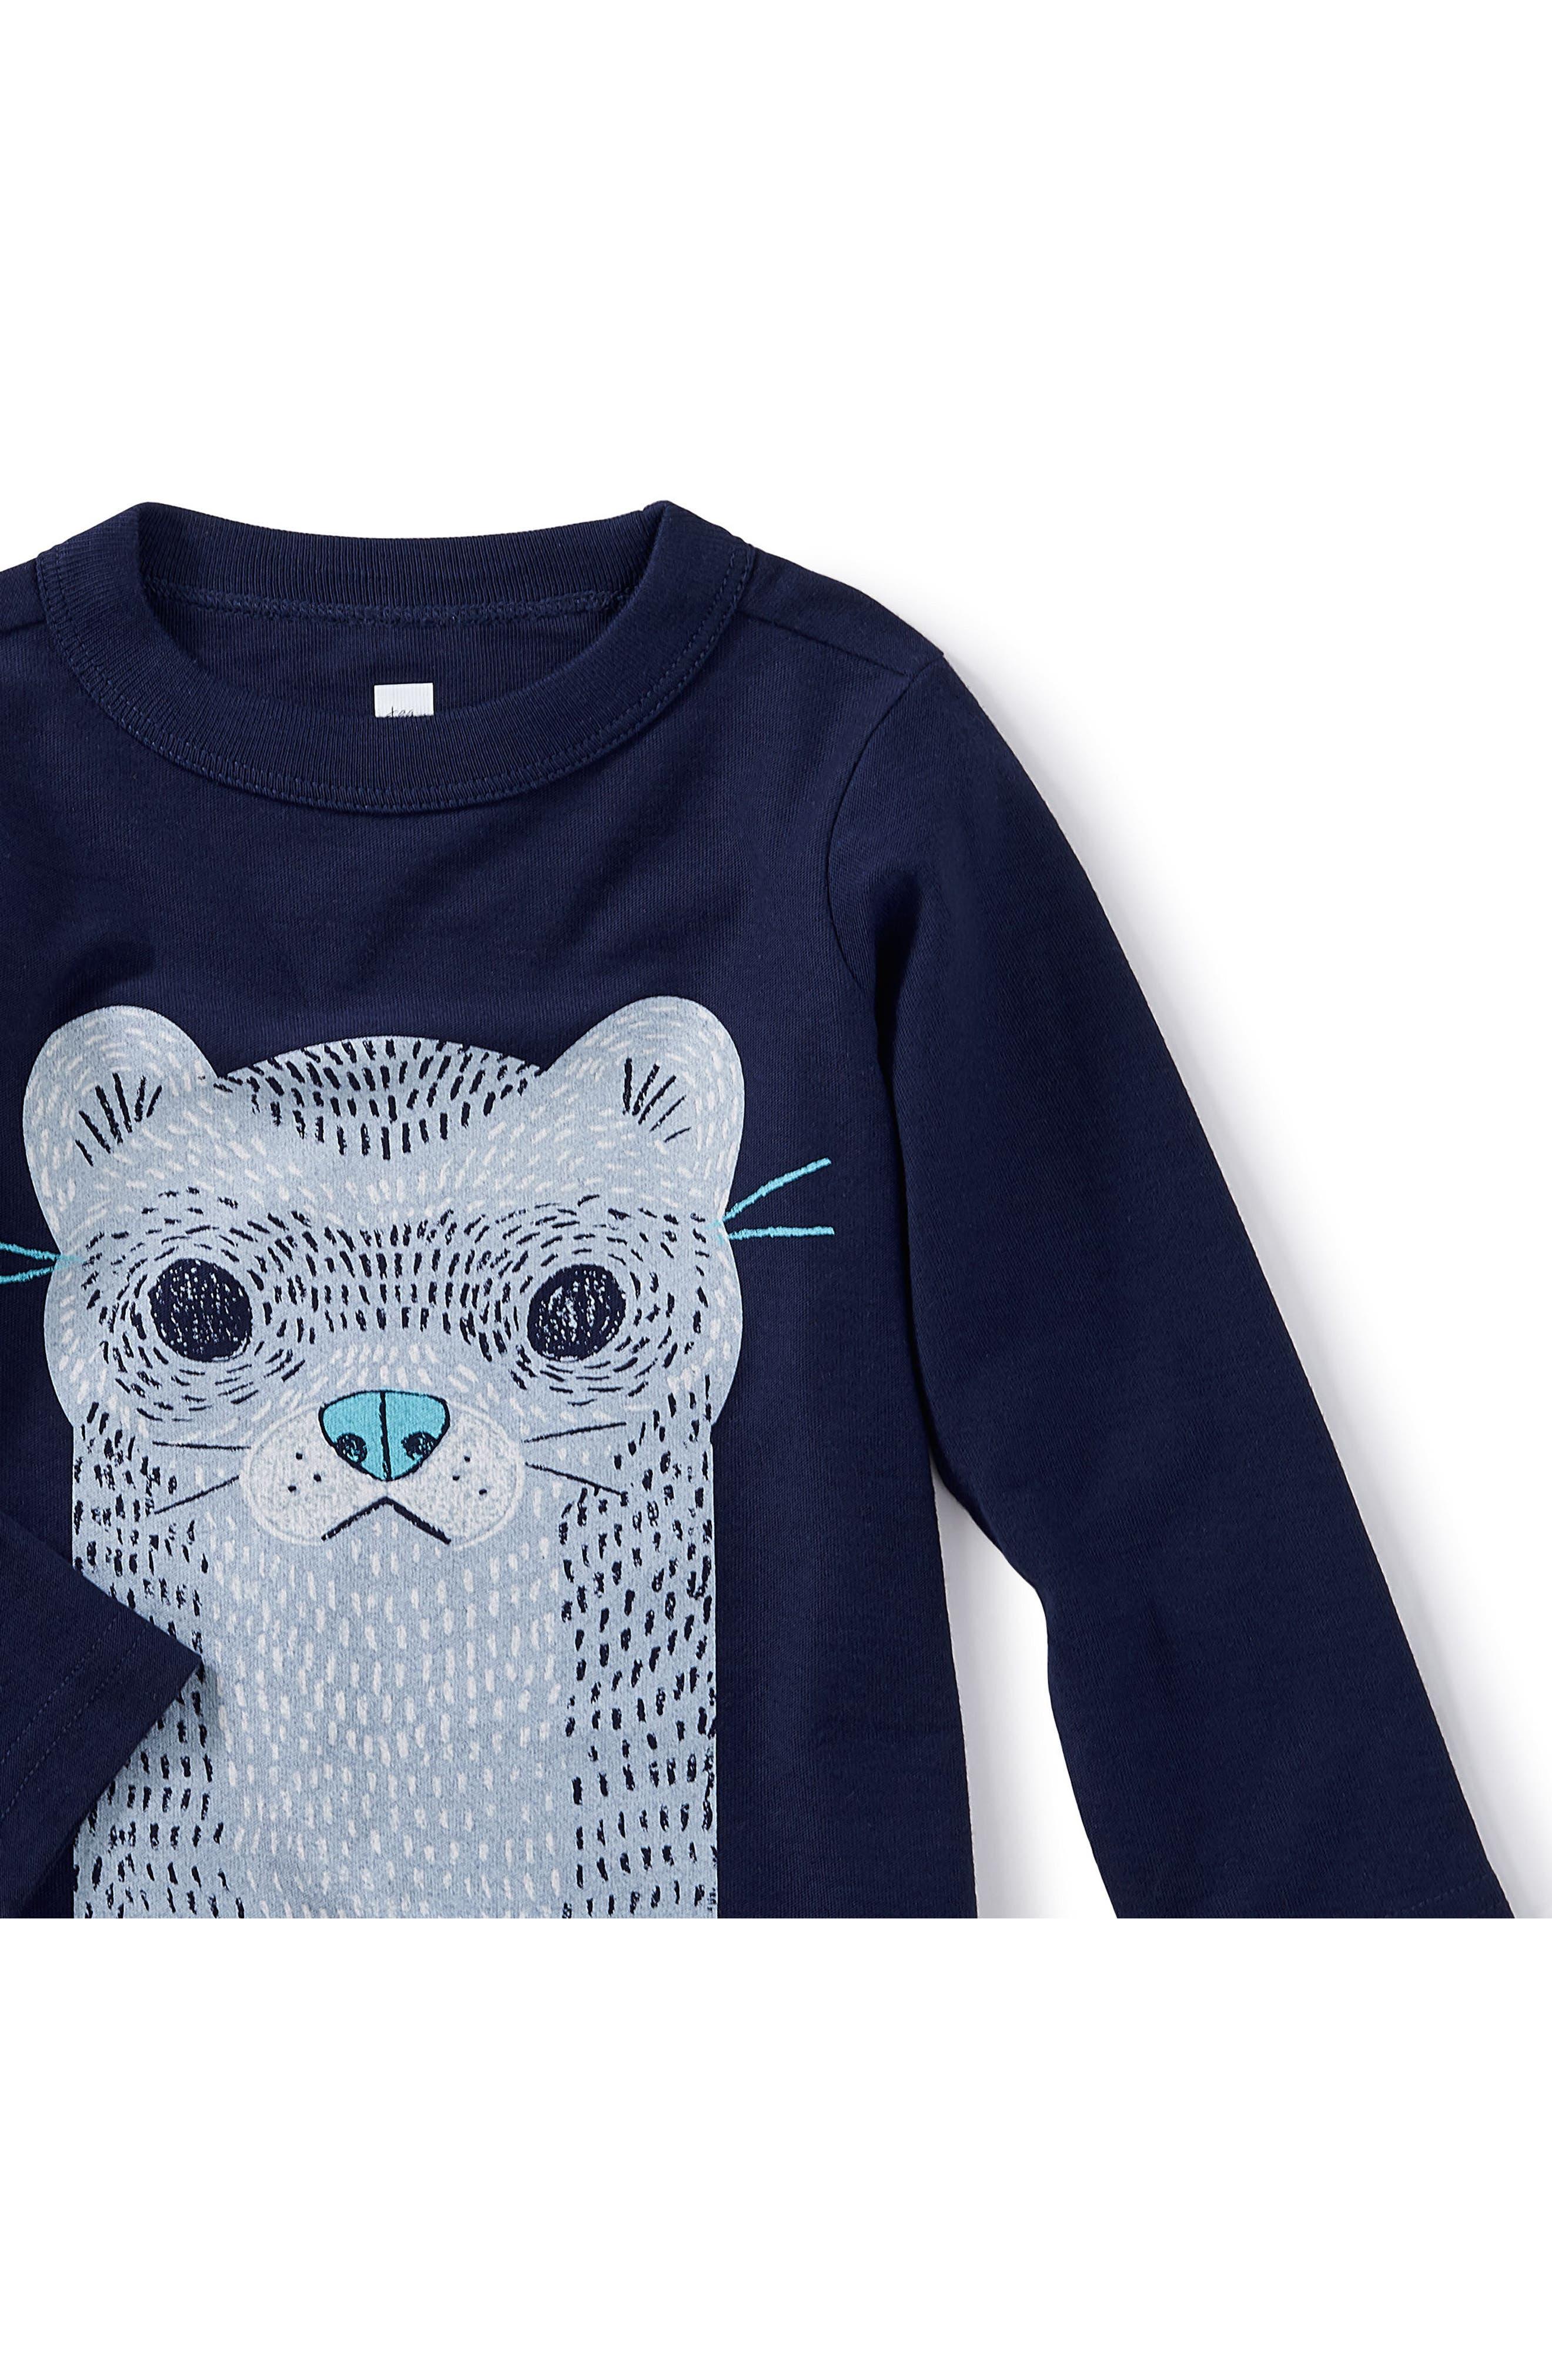 River Otter Graphic T-Shirt,                             Alternate thumbnail 2, color,                             Beluga